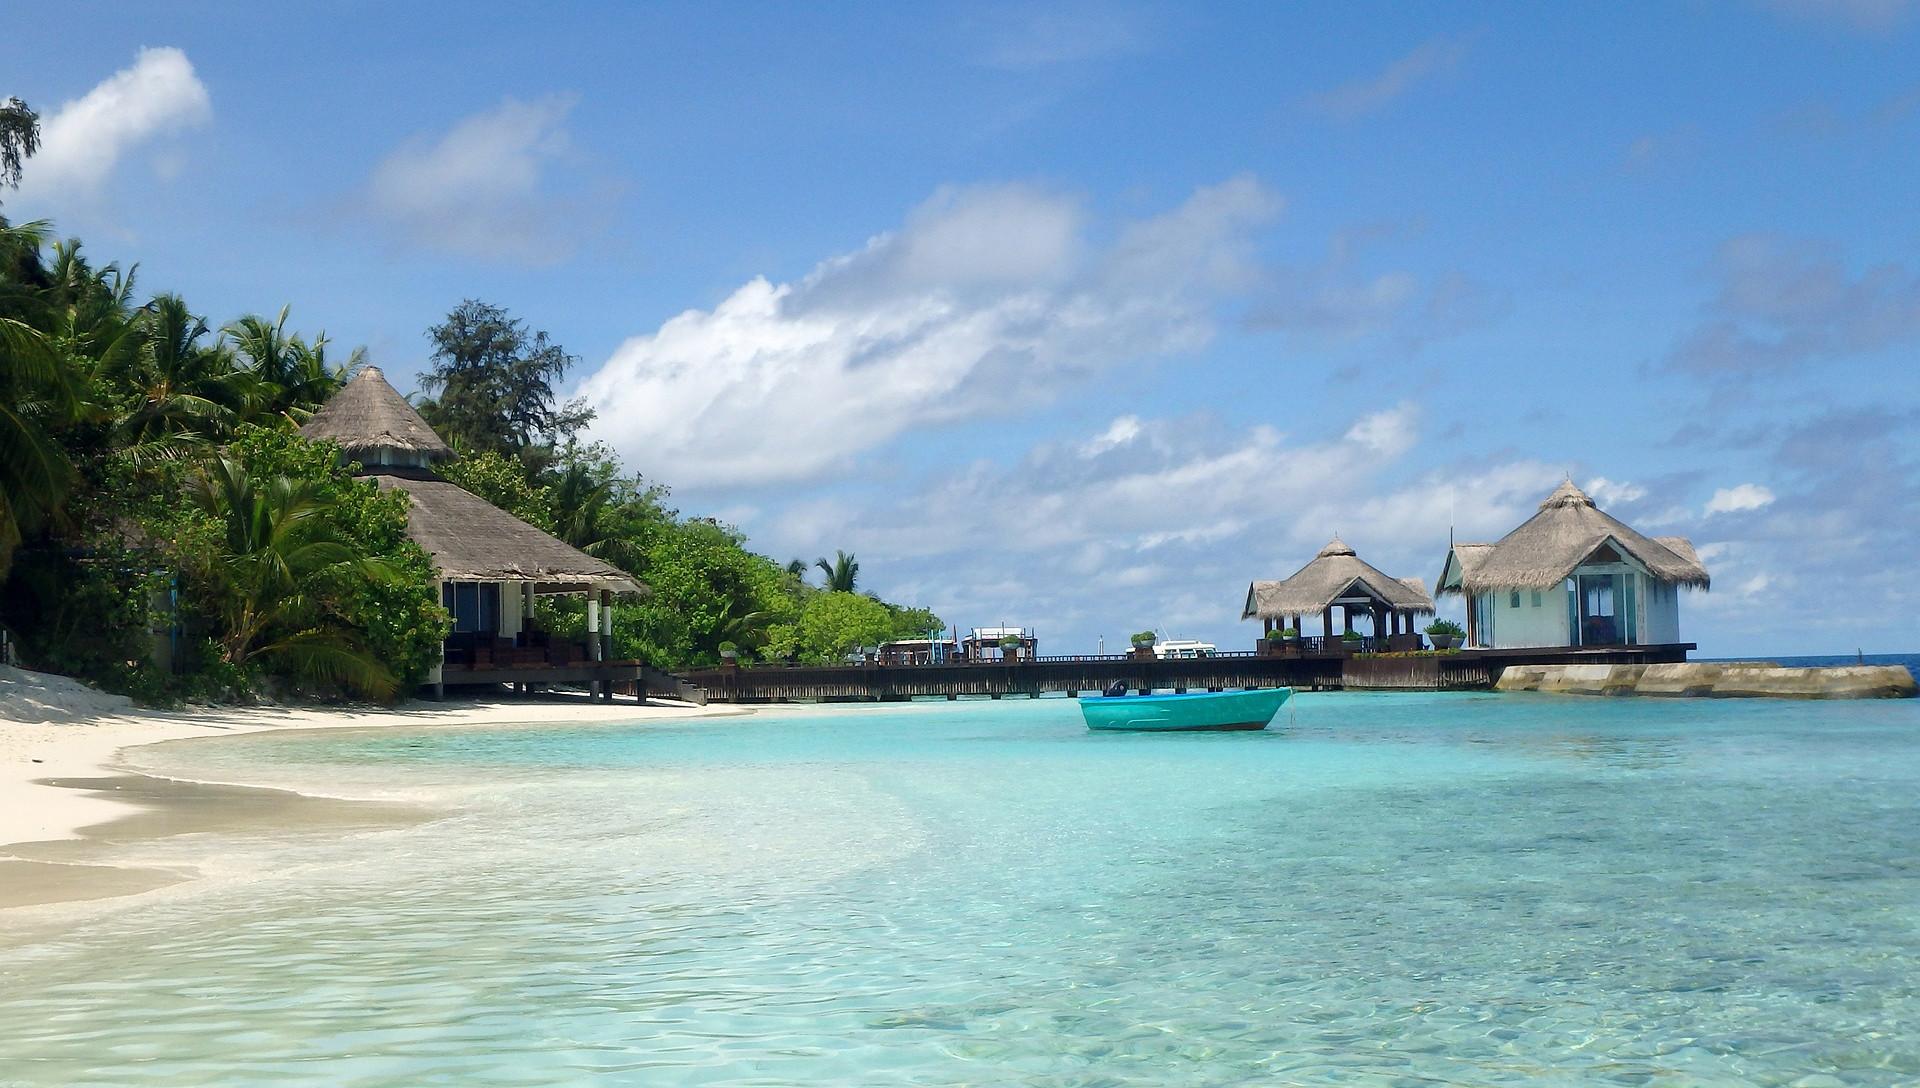 news-main-maldives-leads-global-winners-at-world-travel-awards.1606751918.jpg